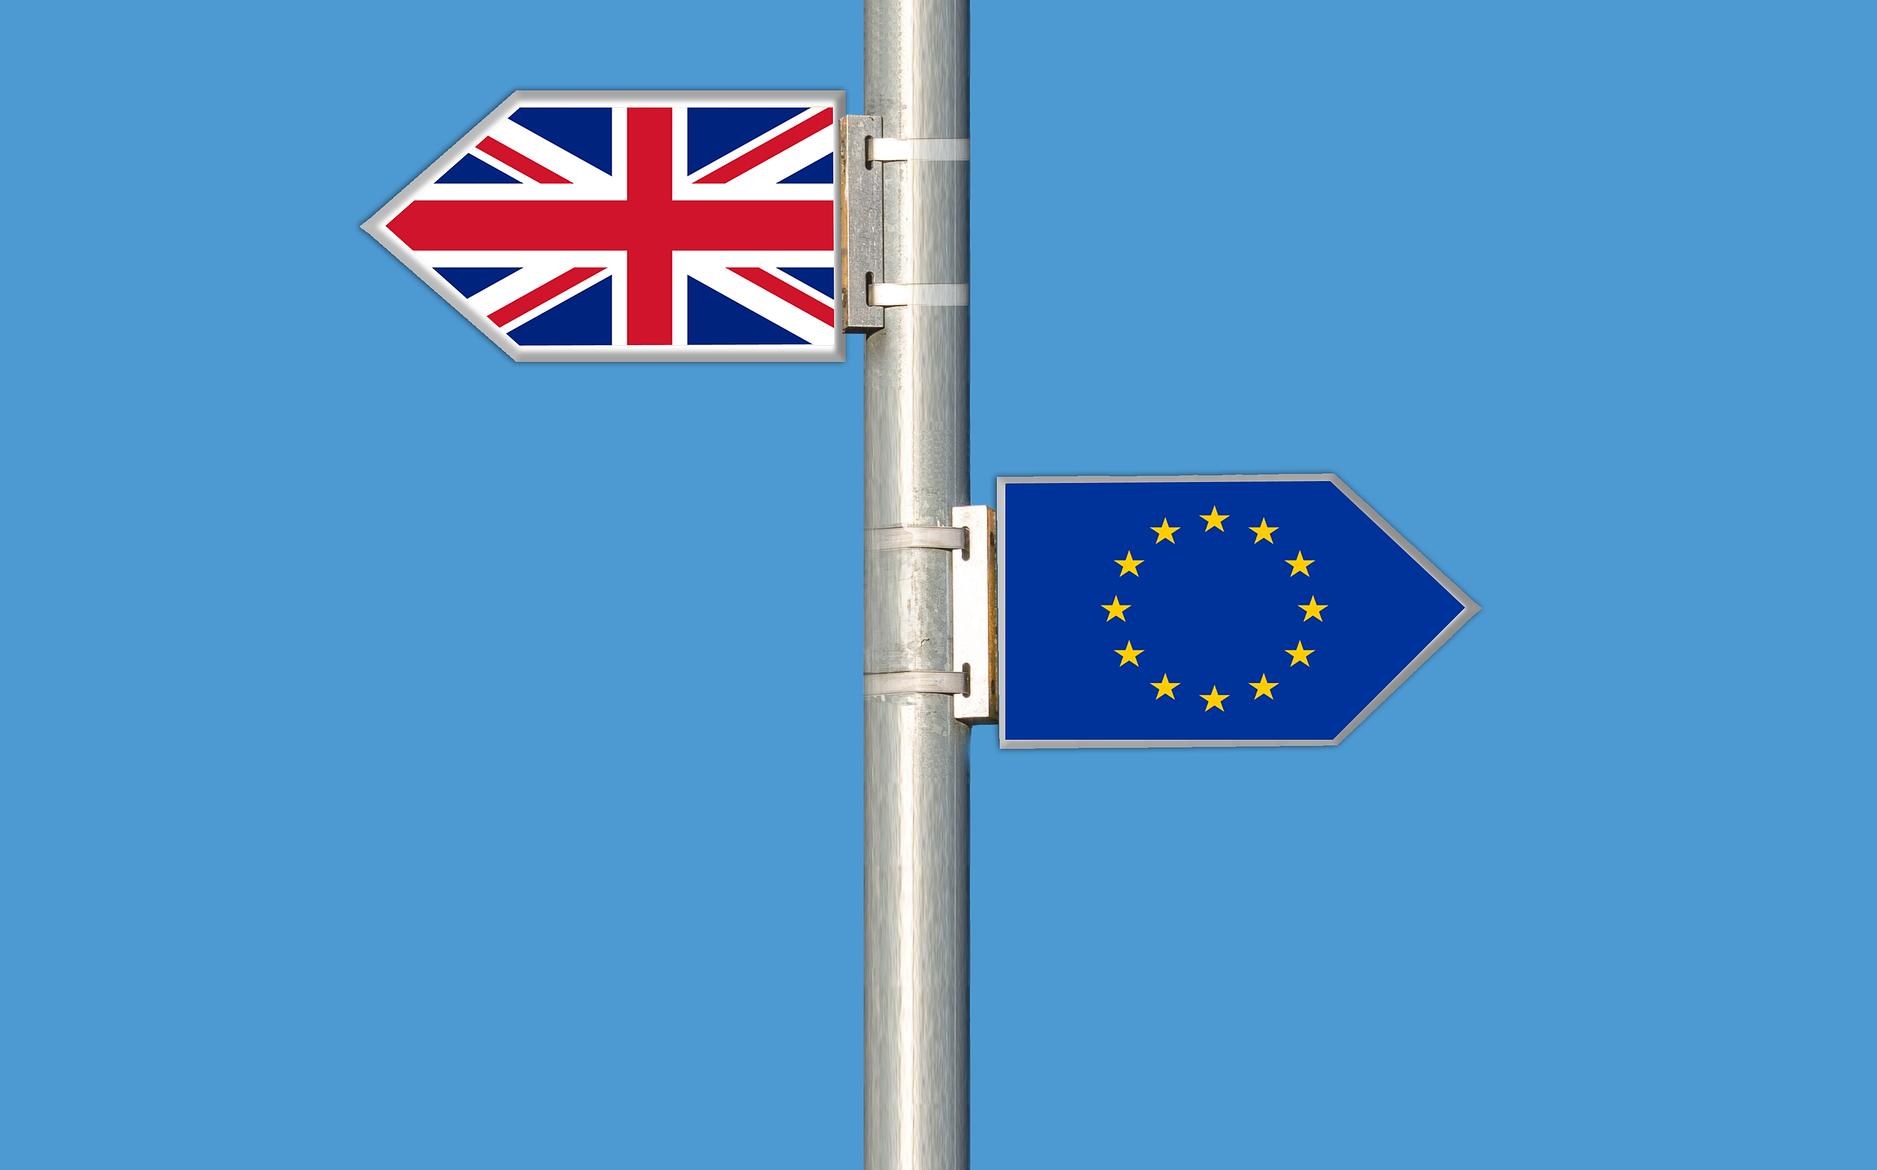 brexit.png (526 KB)